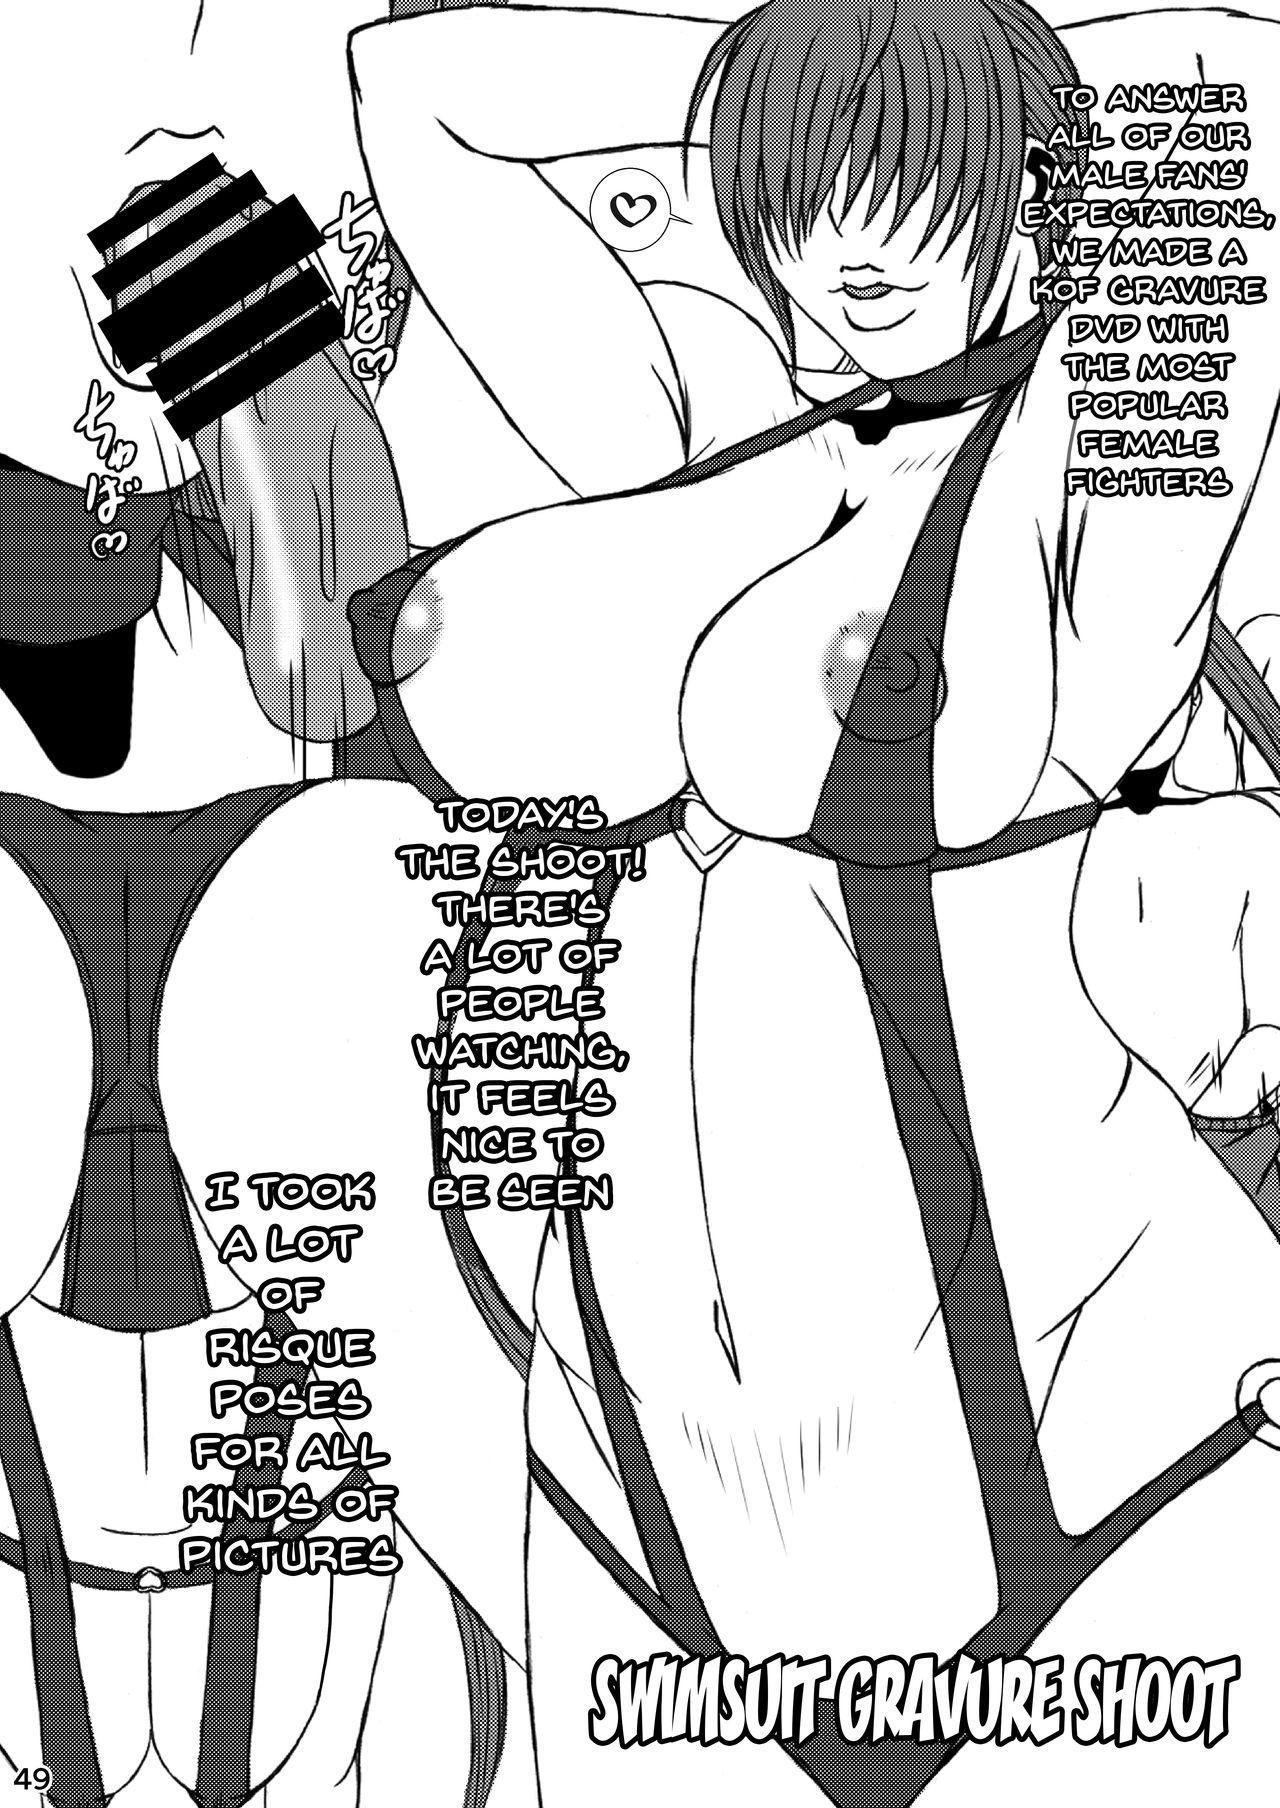 [POWERPLAY (Various)] CAPCOM (& MORE!) VS FIGHTING GIRLS Swimsuit & Gangbang Special (Various) [English] {Doujins.com} [Digital] 45